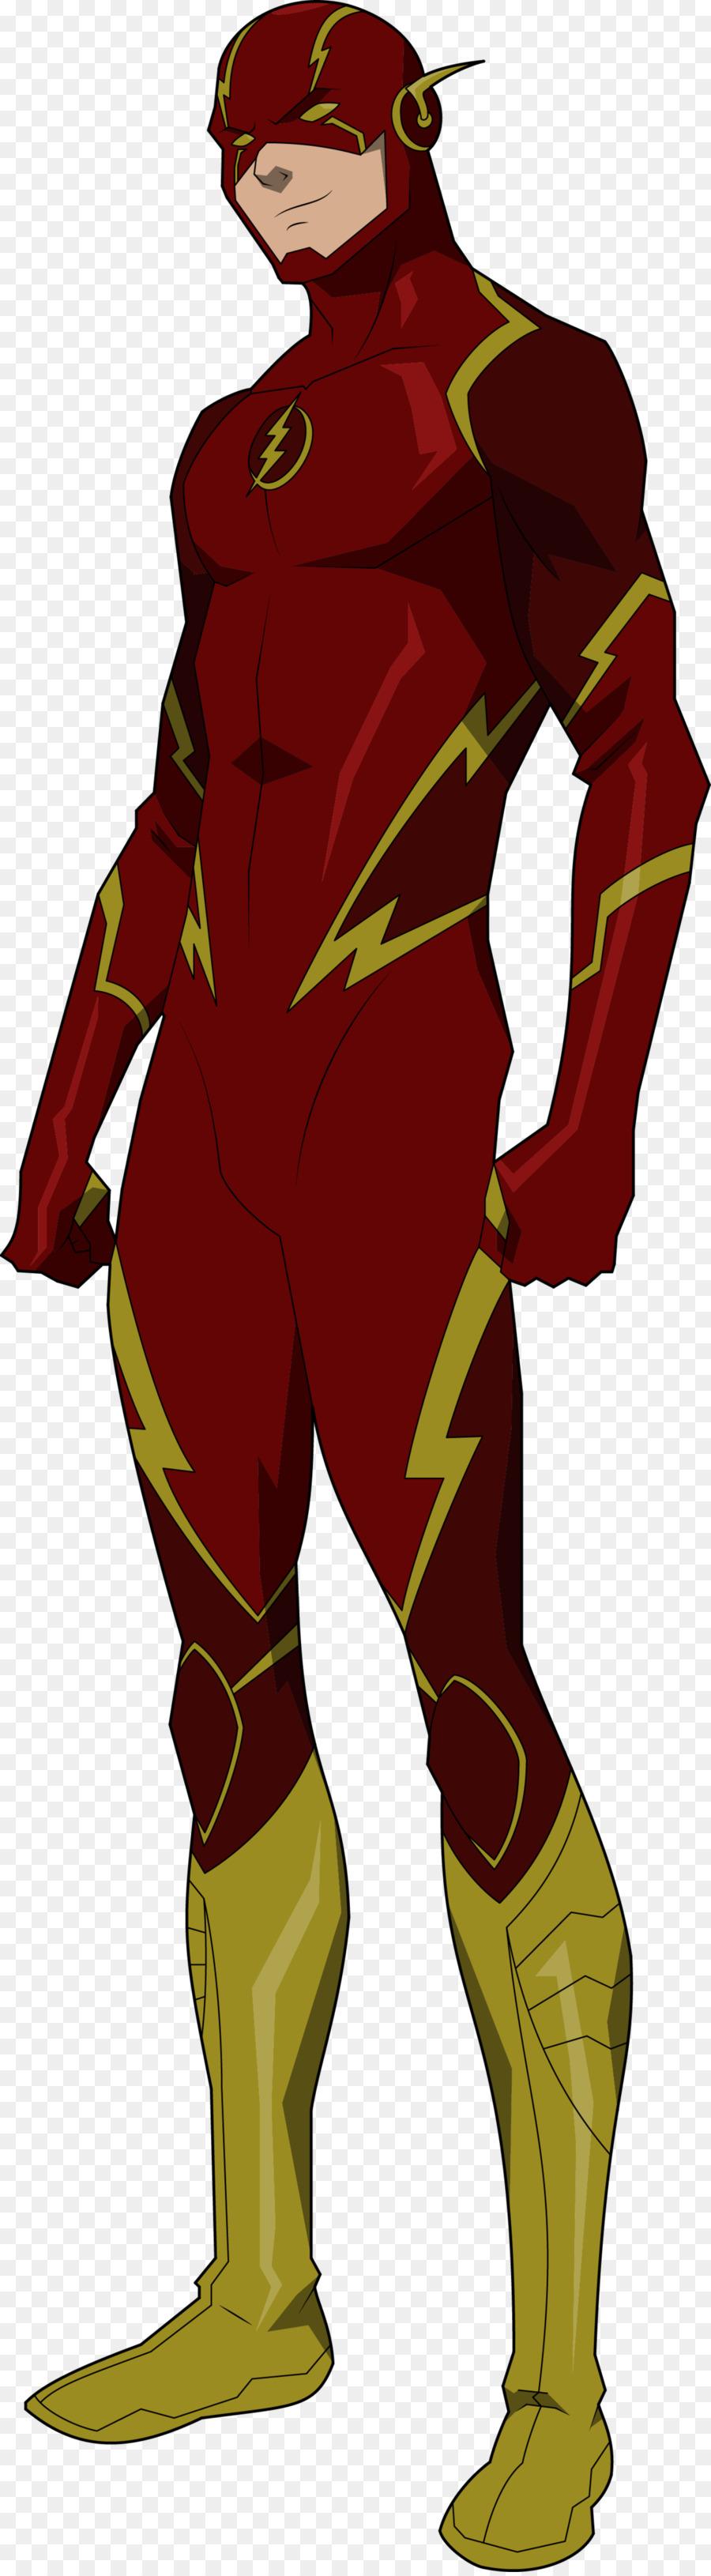 Supergirl Cartoon Png Download 1280 4630 Free Transparent Flash Png Download Cleanpng Kisspng